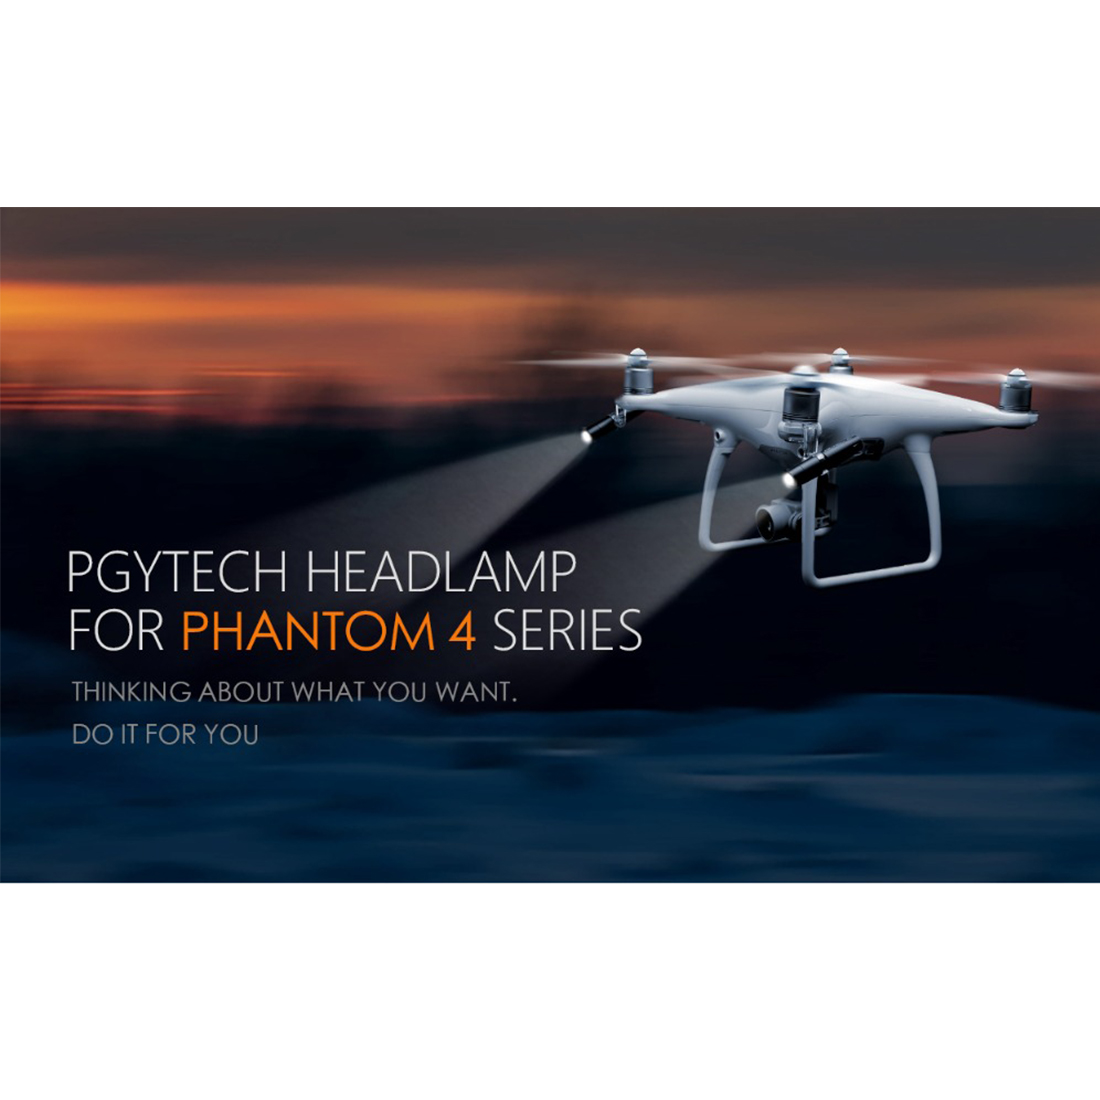 pgytech-new-headlamp-front-viewfinder-bright-led-lights-headlight-spotlight-for-font-b-dji-b-font-font-b-phantom-b-font-4-4-pro-4-pro-4-drone-accessories